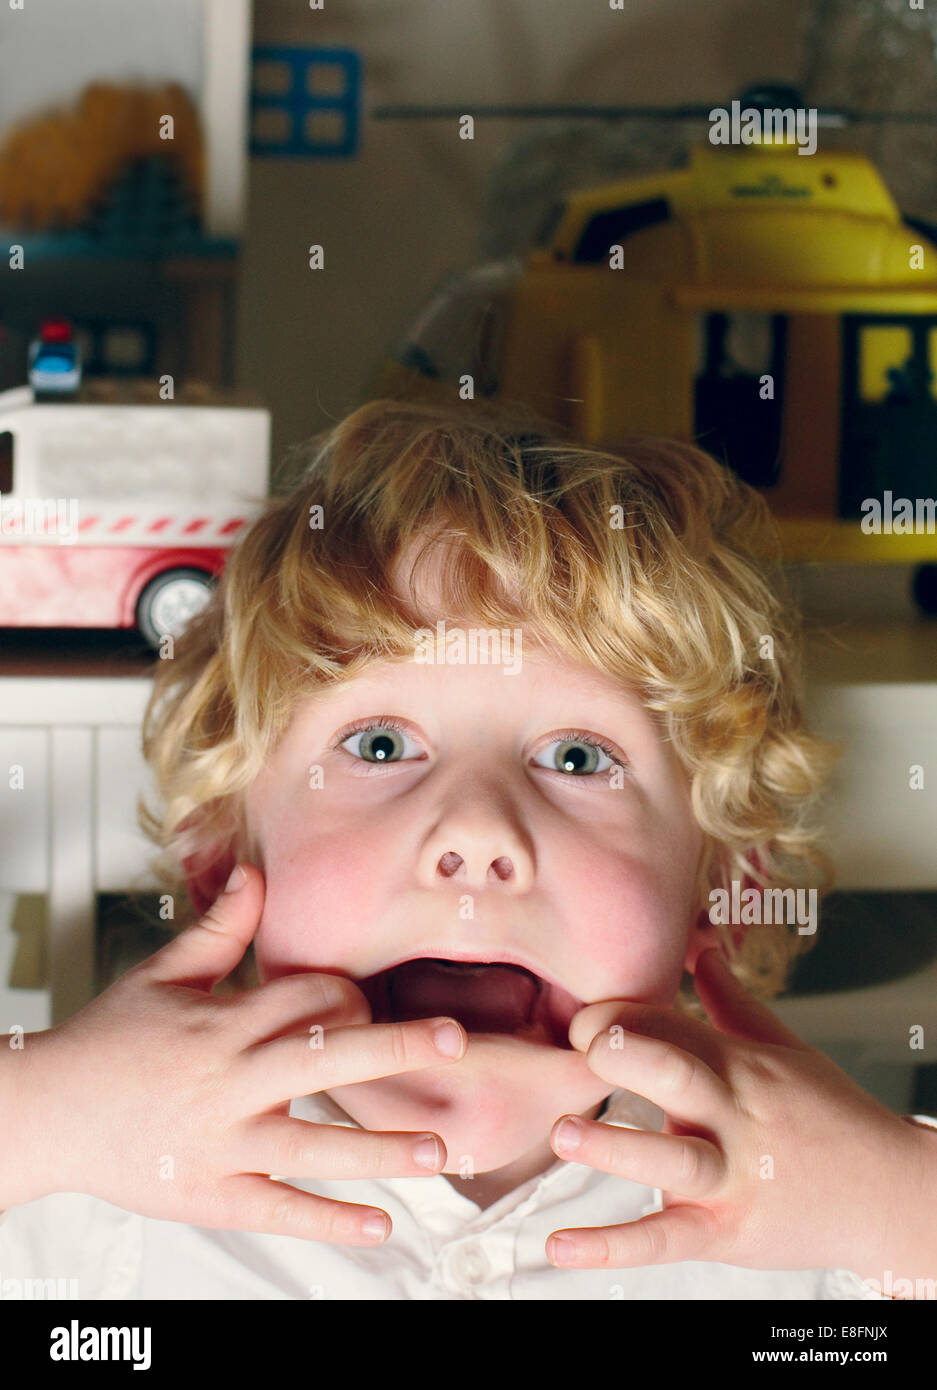 Netherlands, Portrait of boy making funny faces - Stock Image